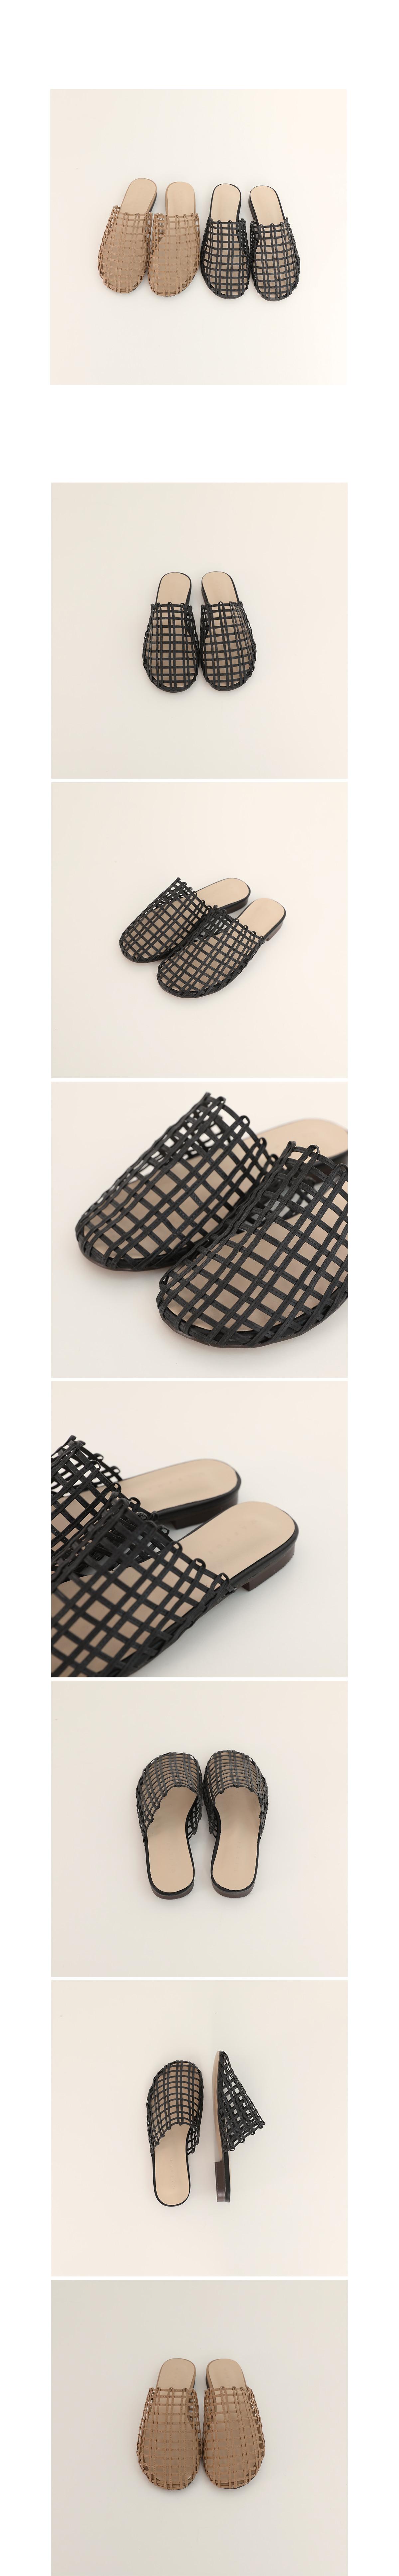 Weaving Ethnic Slippers